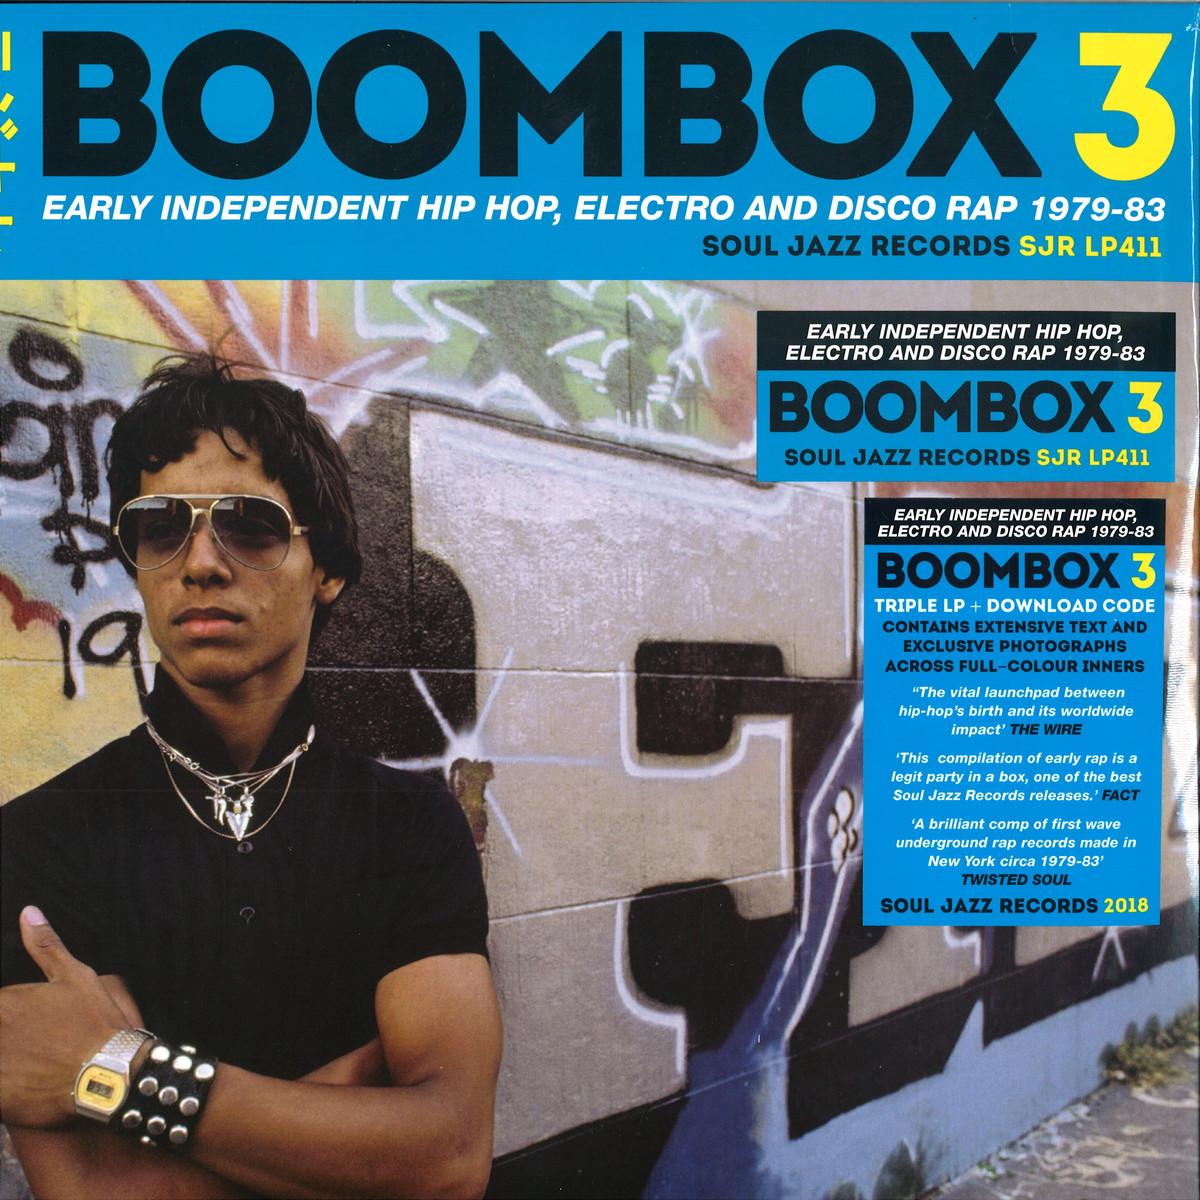 Soul Jazz Records Presents - BOOMBOX 3 / Soul Jazz Records